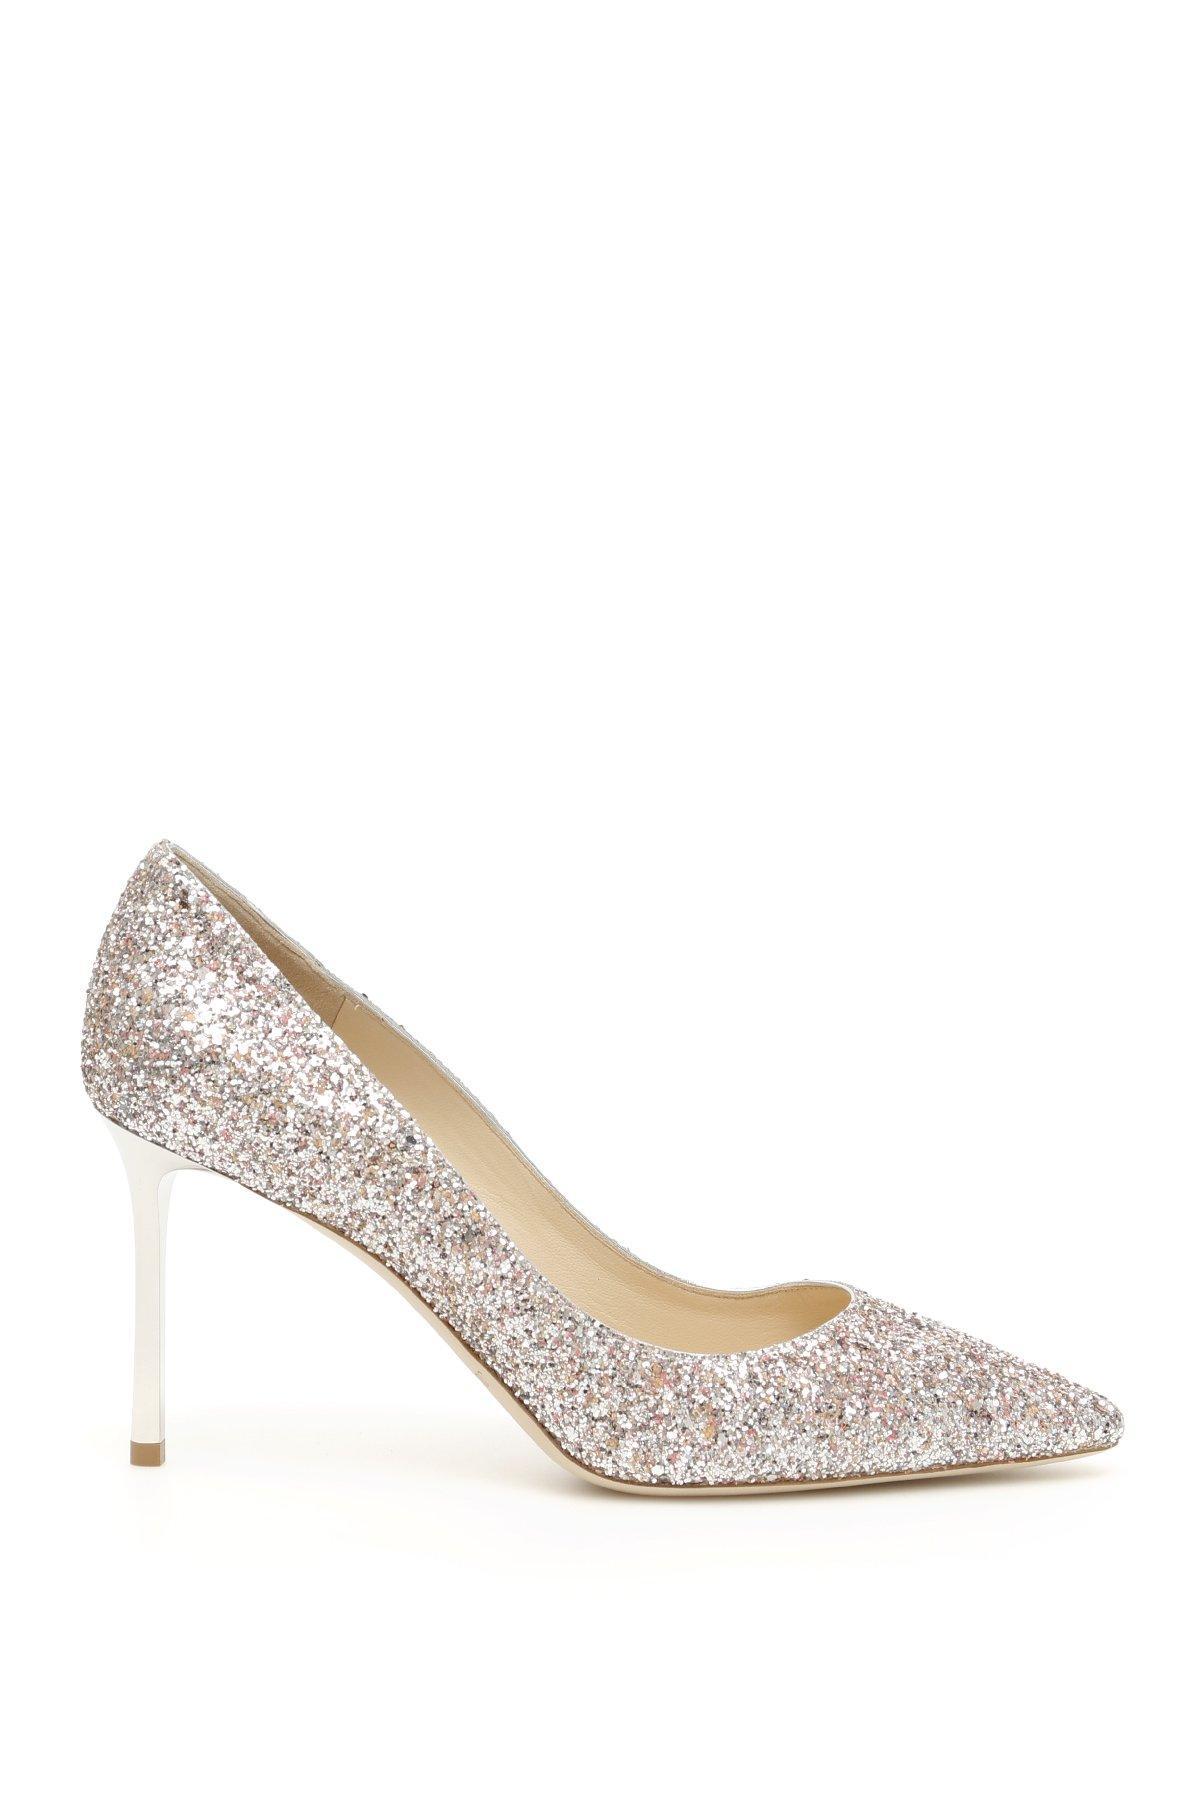 b31ad72efc Jimmy Choo. Women's Metallic Romy 85 Glitter Court Shoes